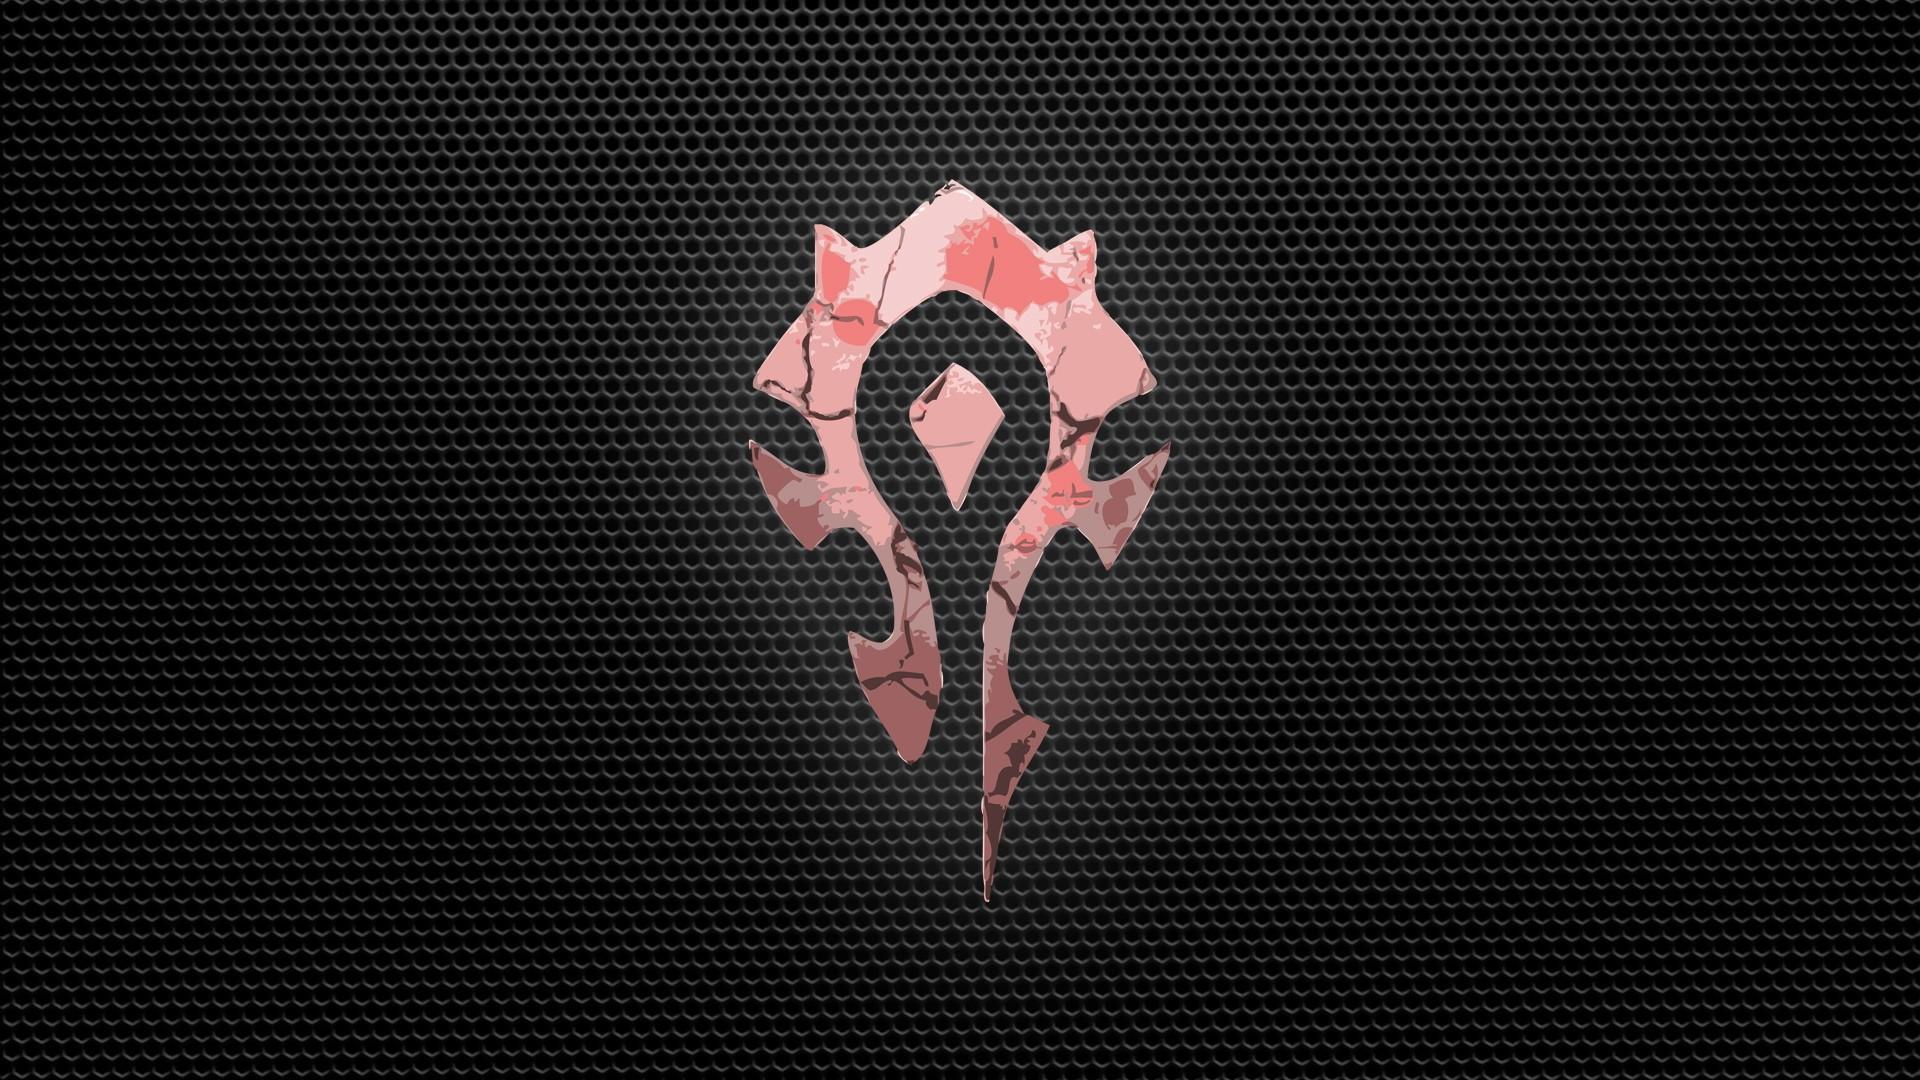 Wallpaper Black Video Games World Of Warcraft Texture Horde